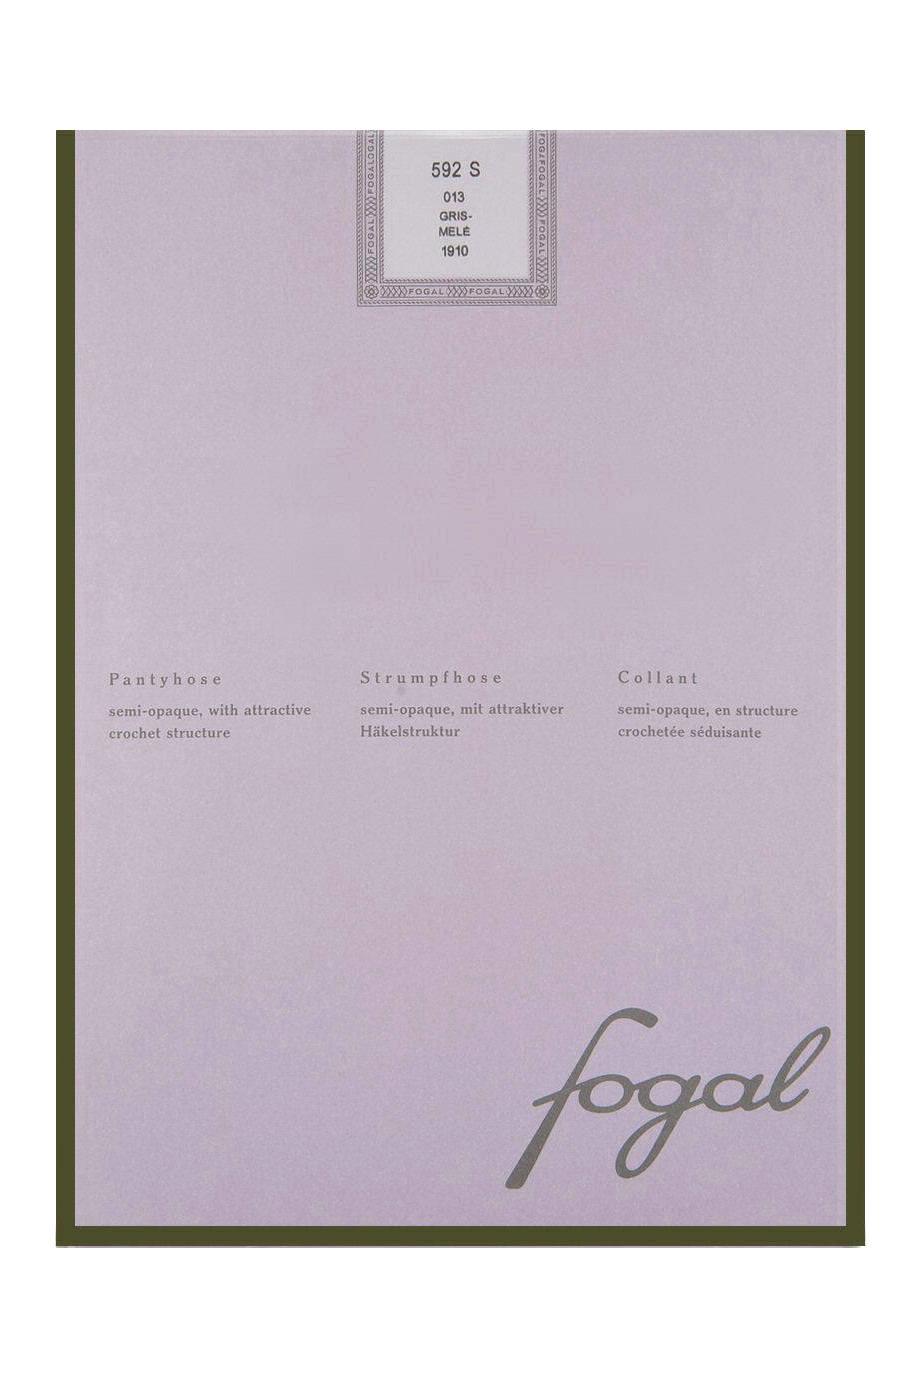 fogal13-33